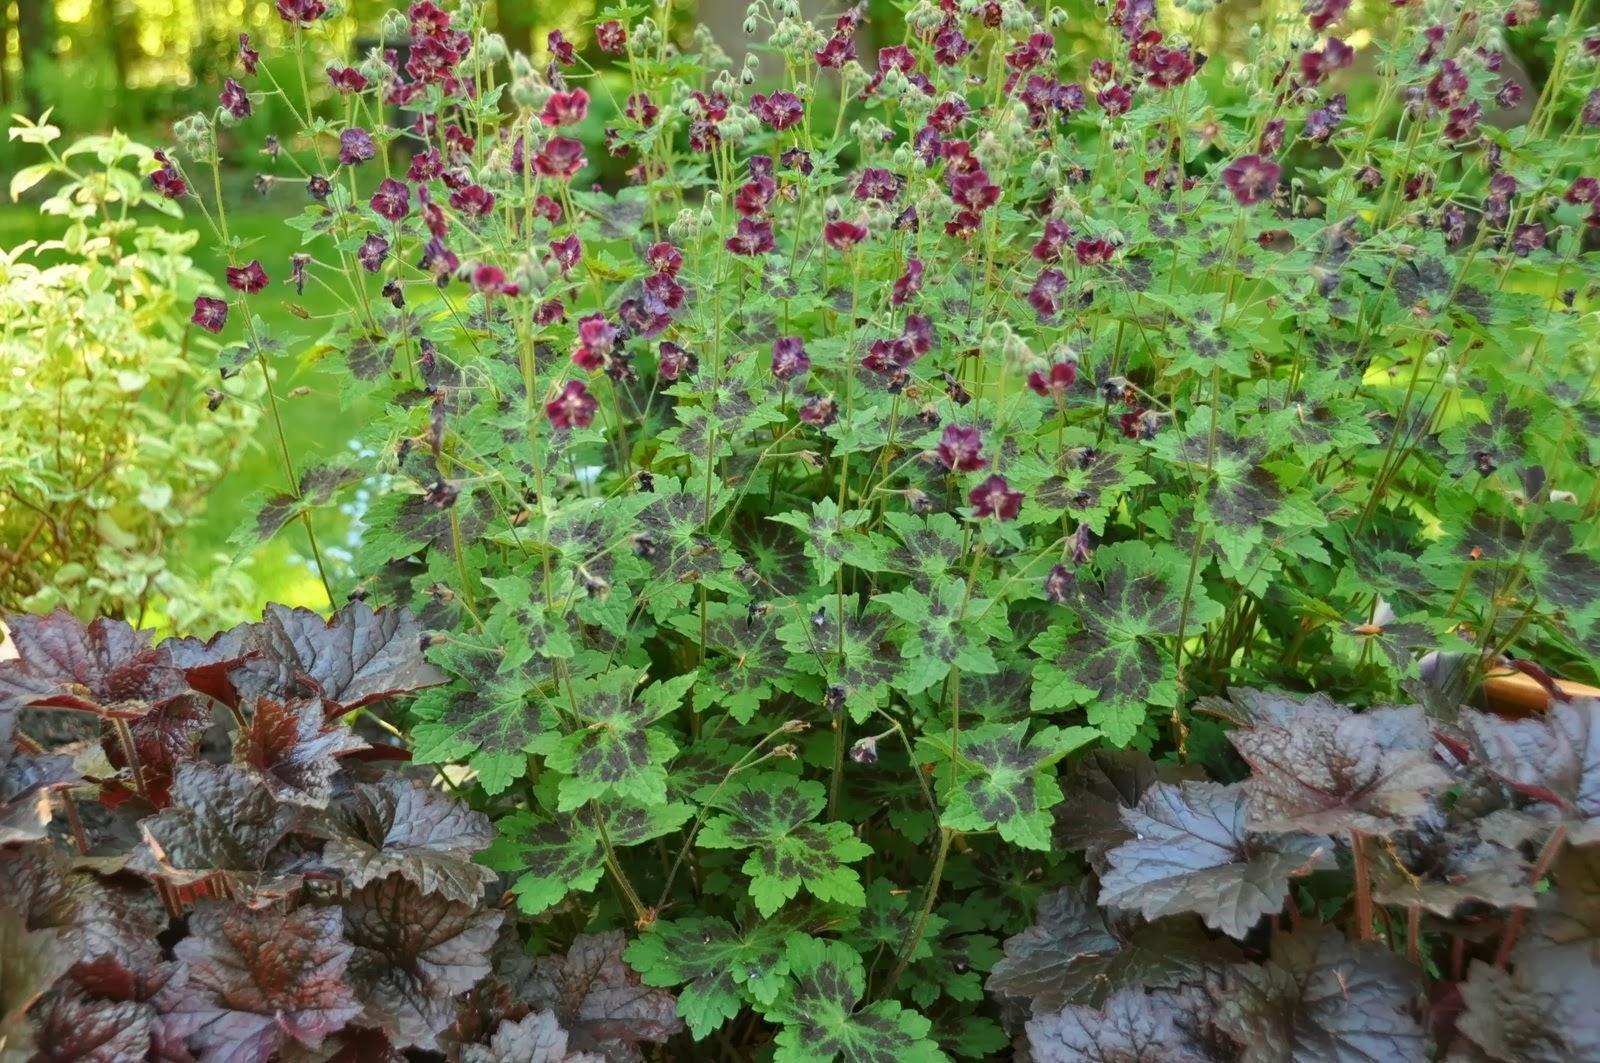 Geranium dark Samobor